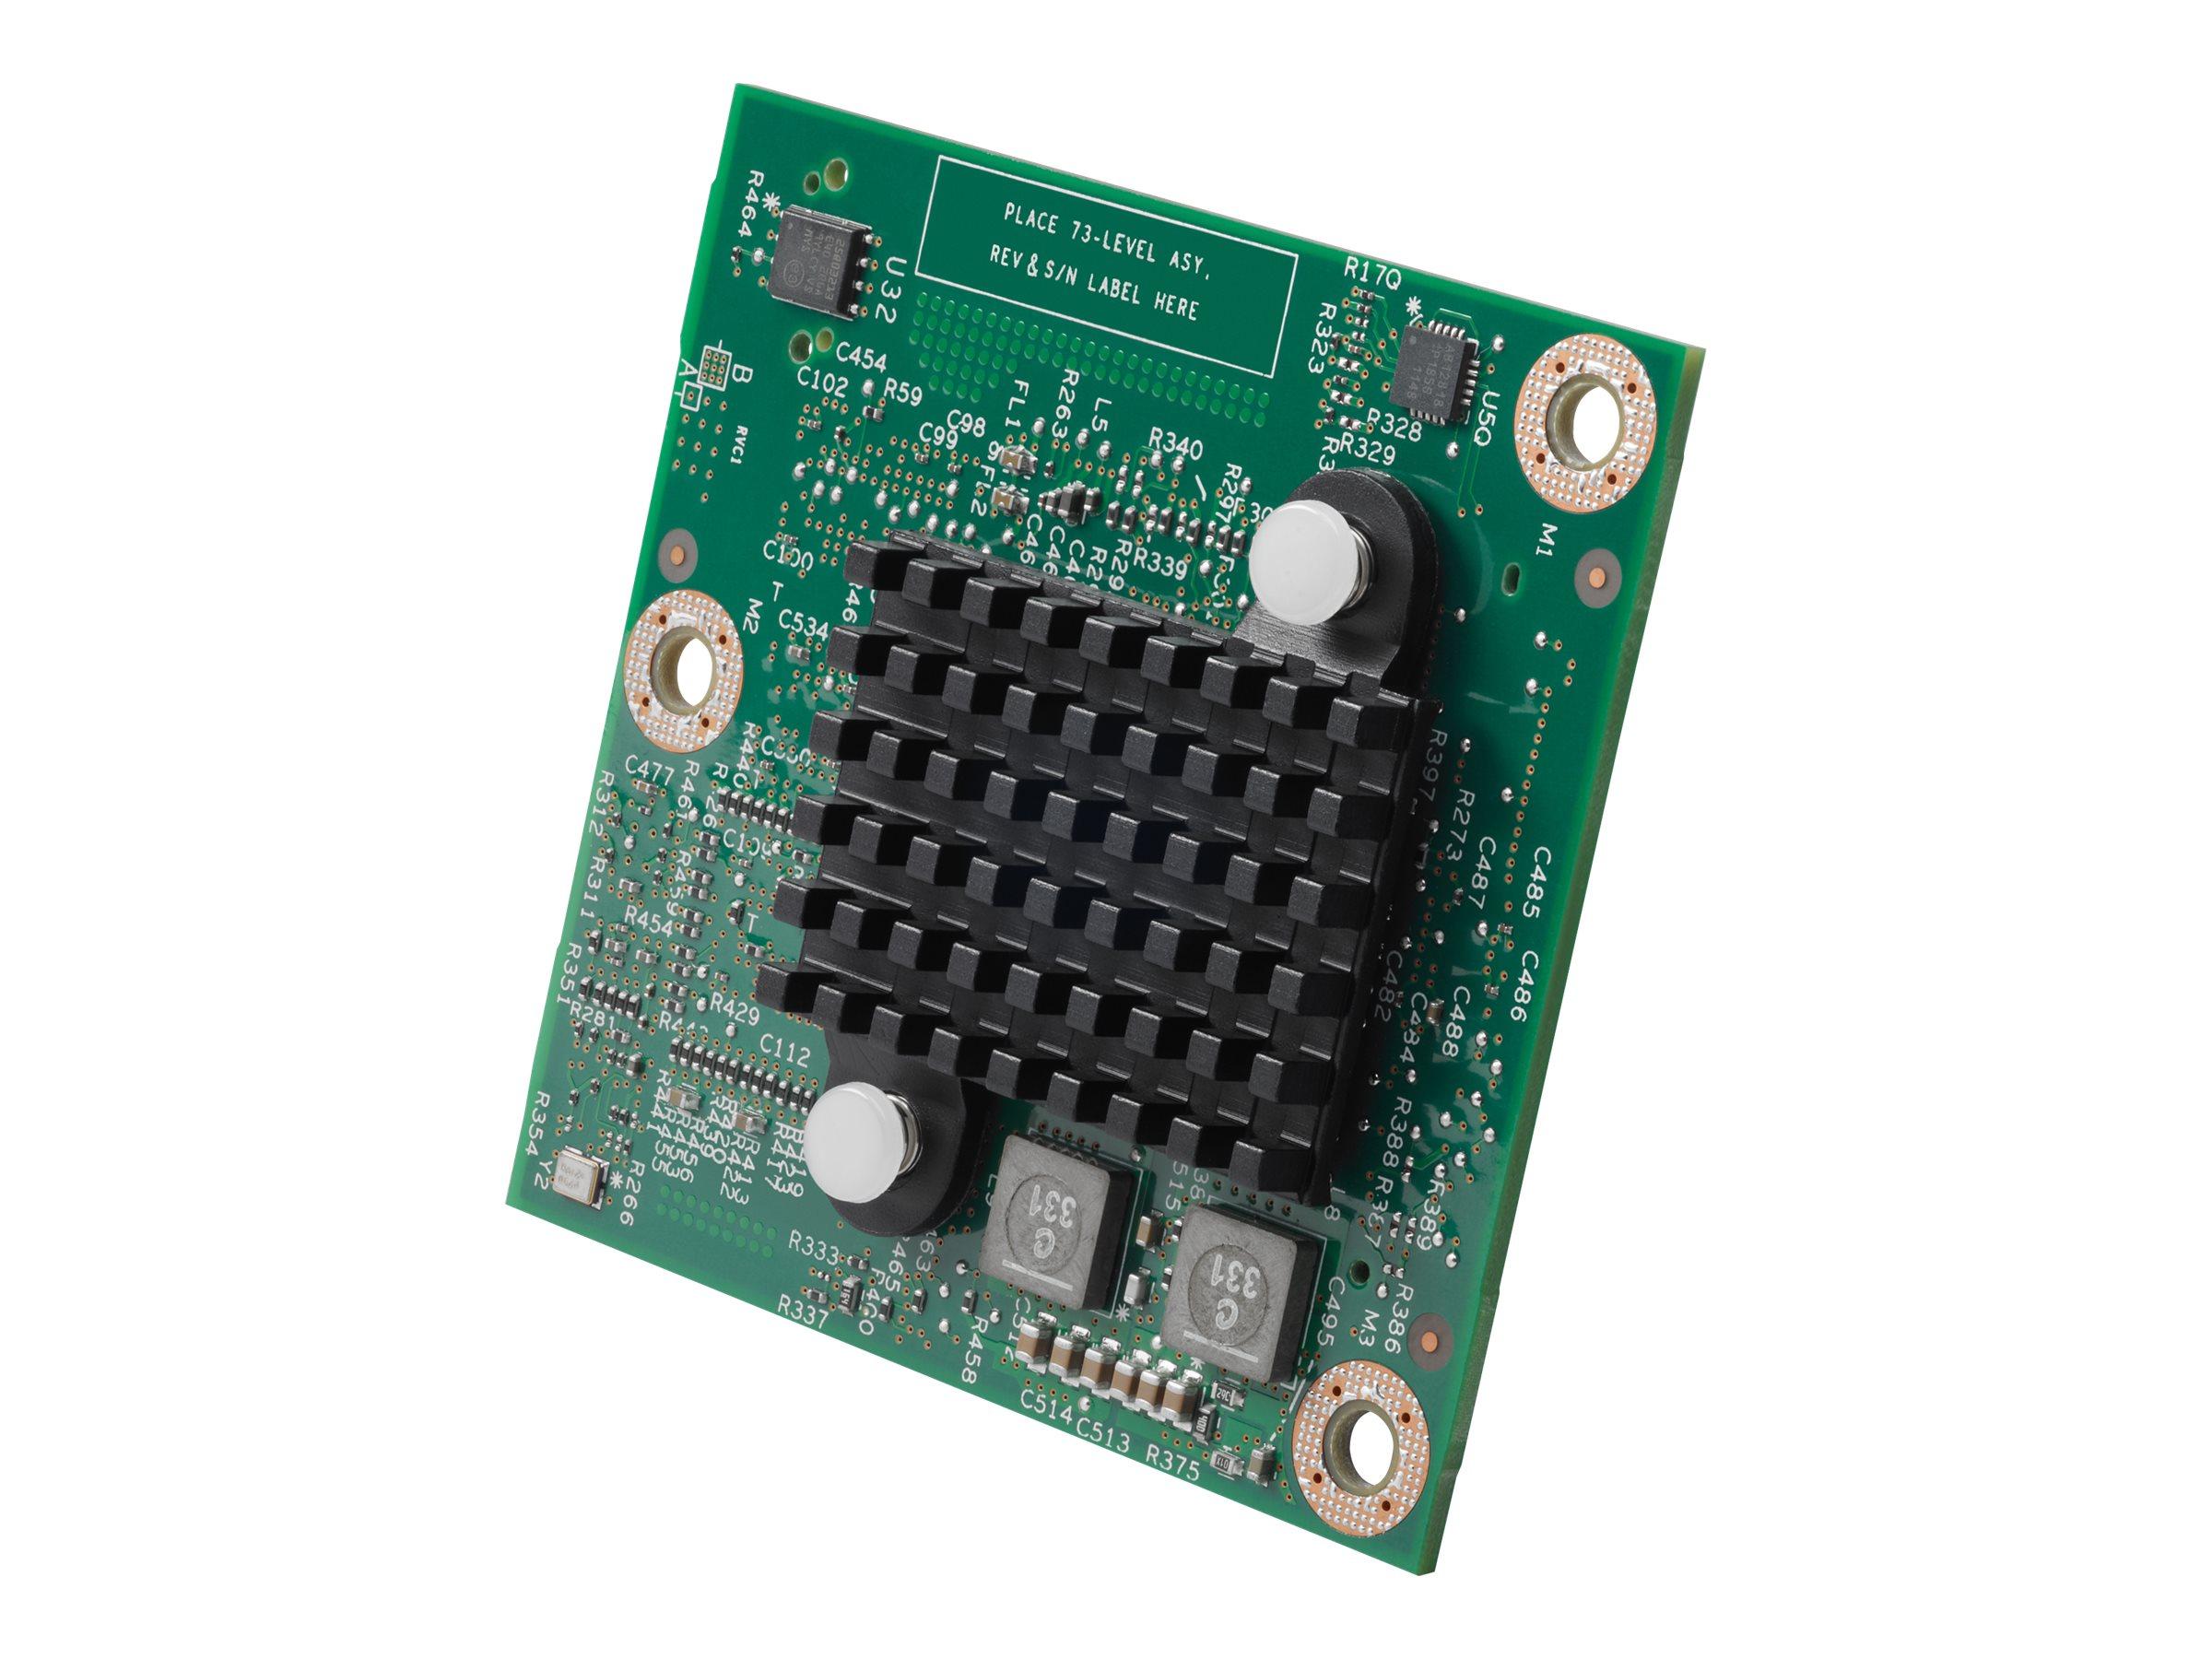 Cisco Fourth-Generation 256-Channel High-Density Packet Voice Digital Signal Processor Module